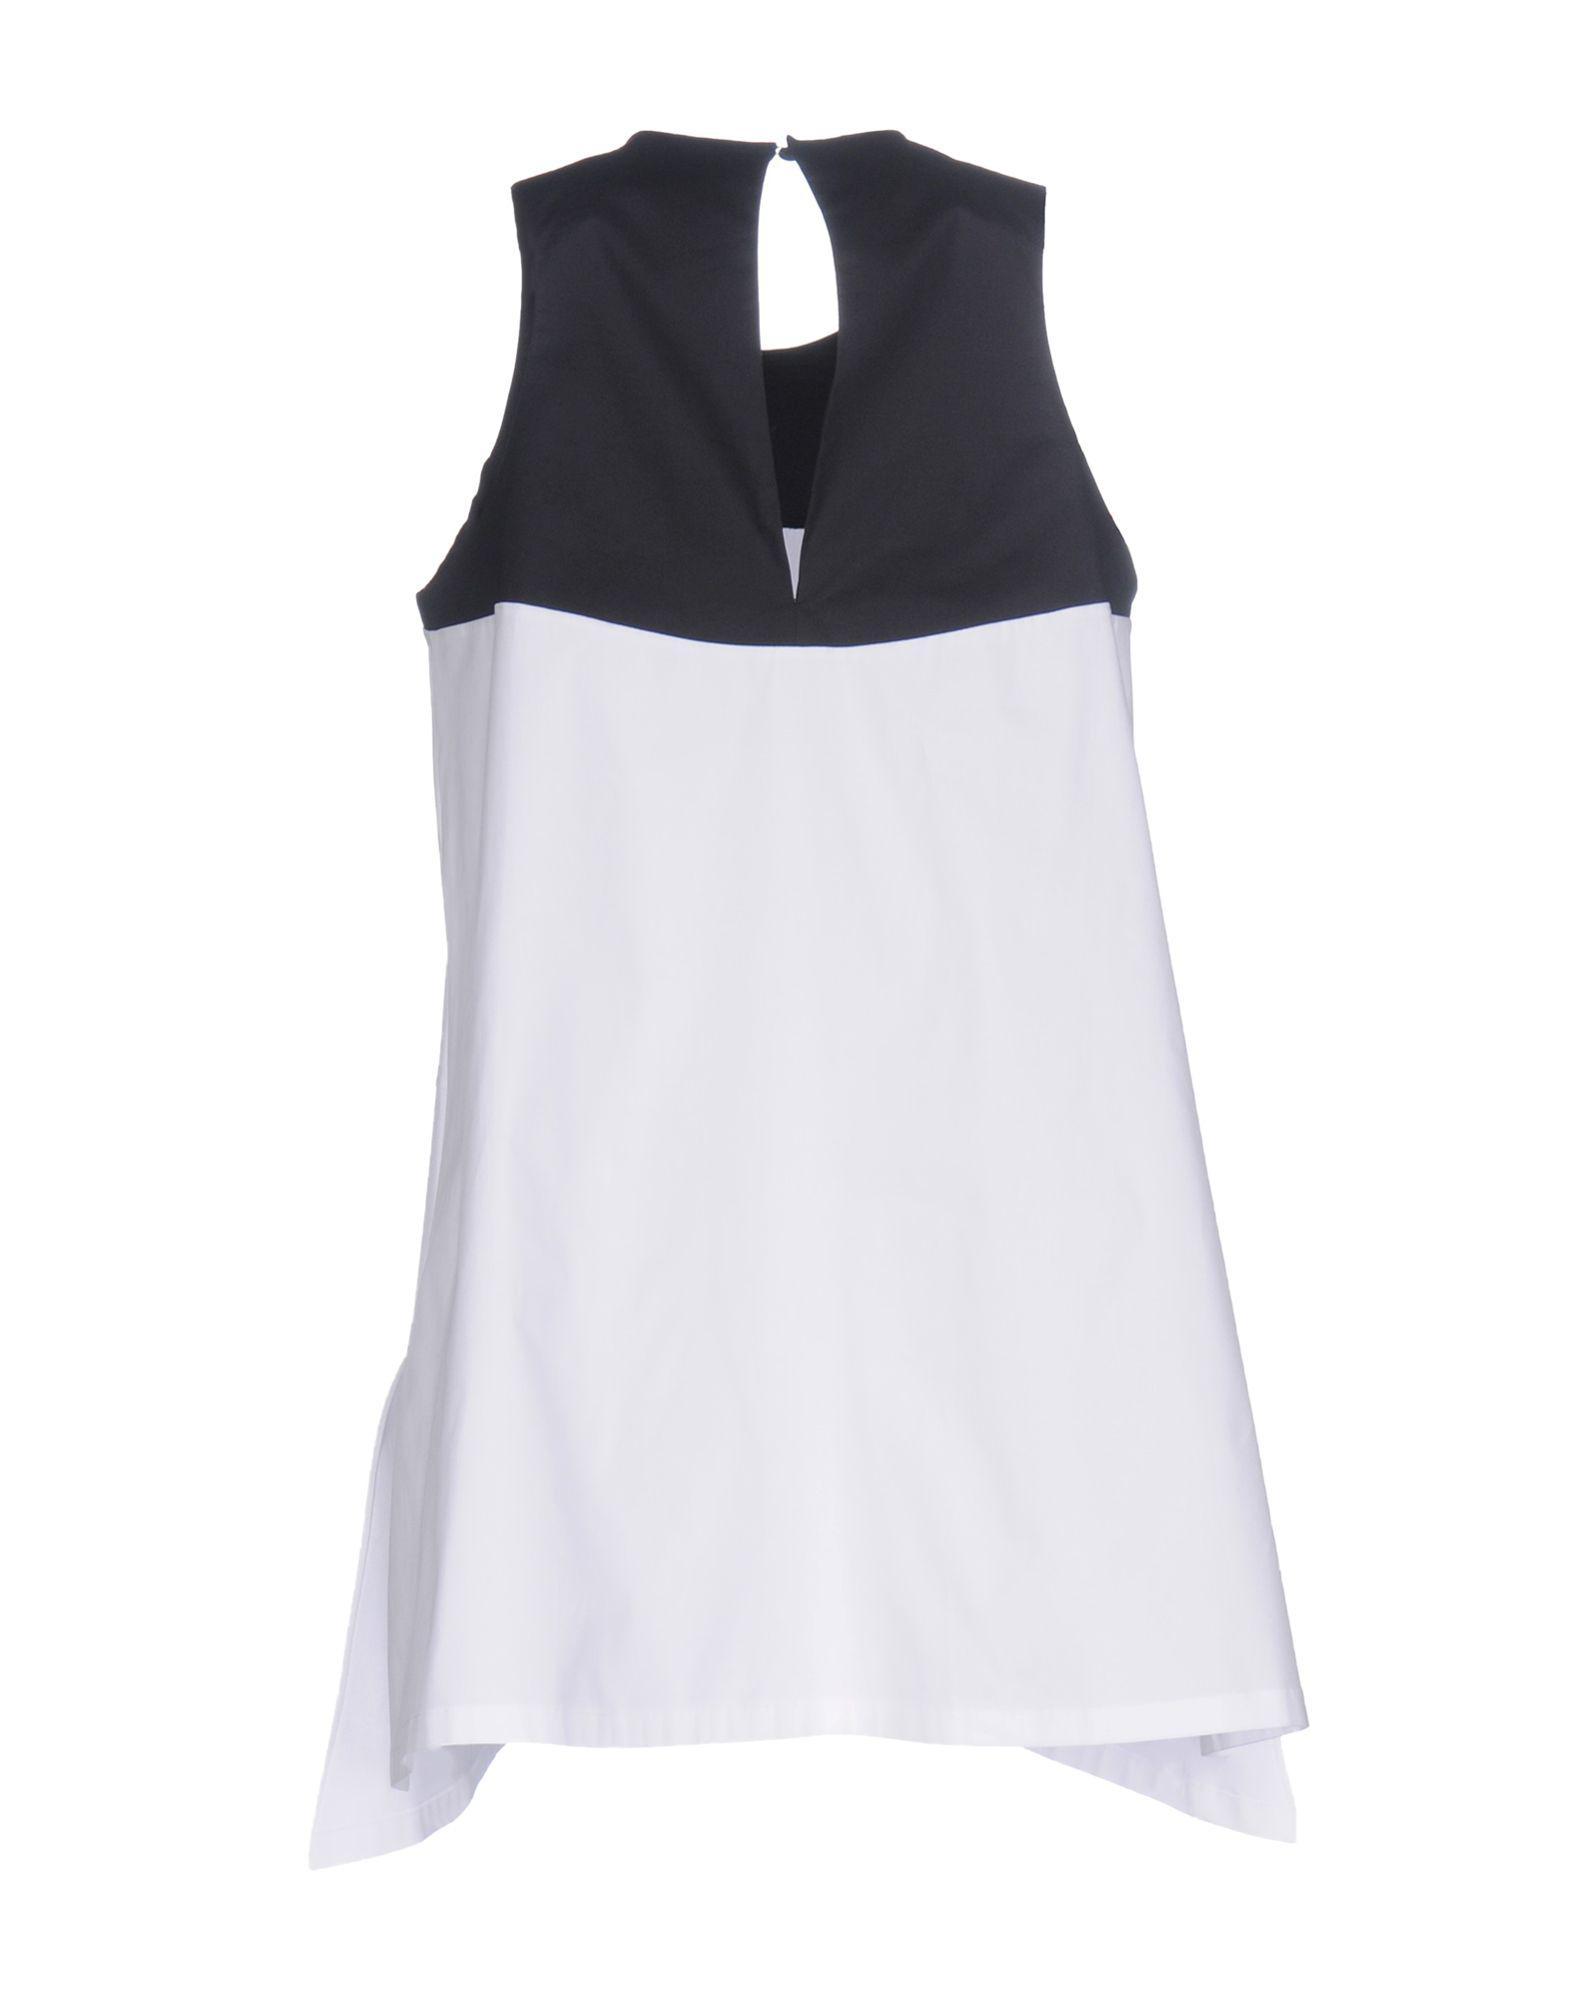 526f0691 Lyst - Jil Sander Navy Top in White